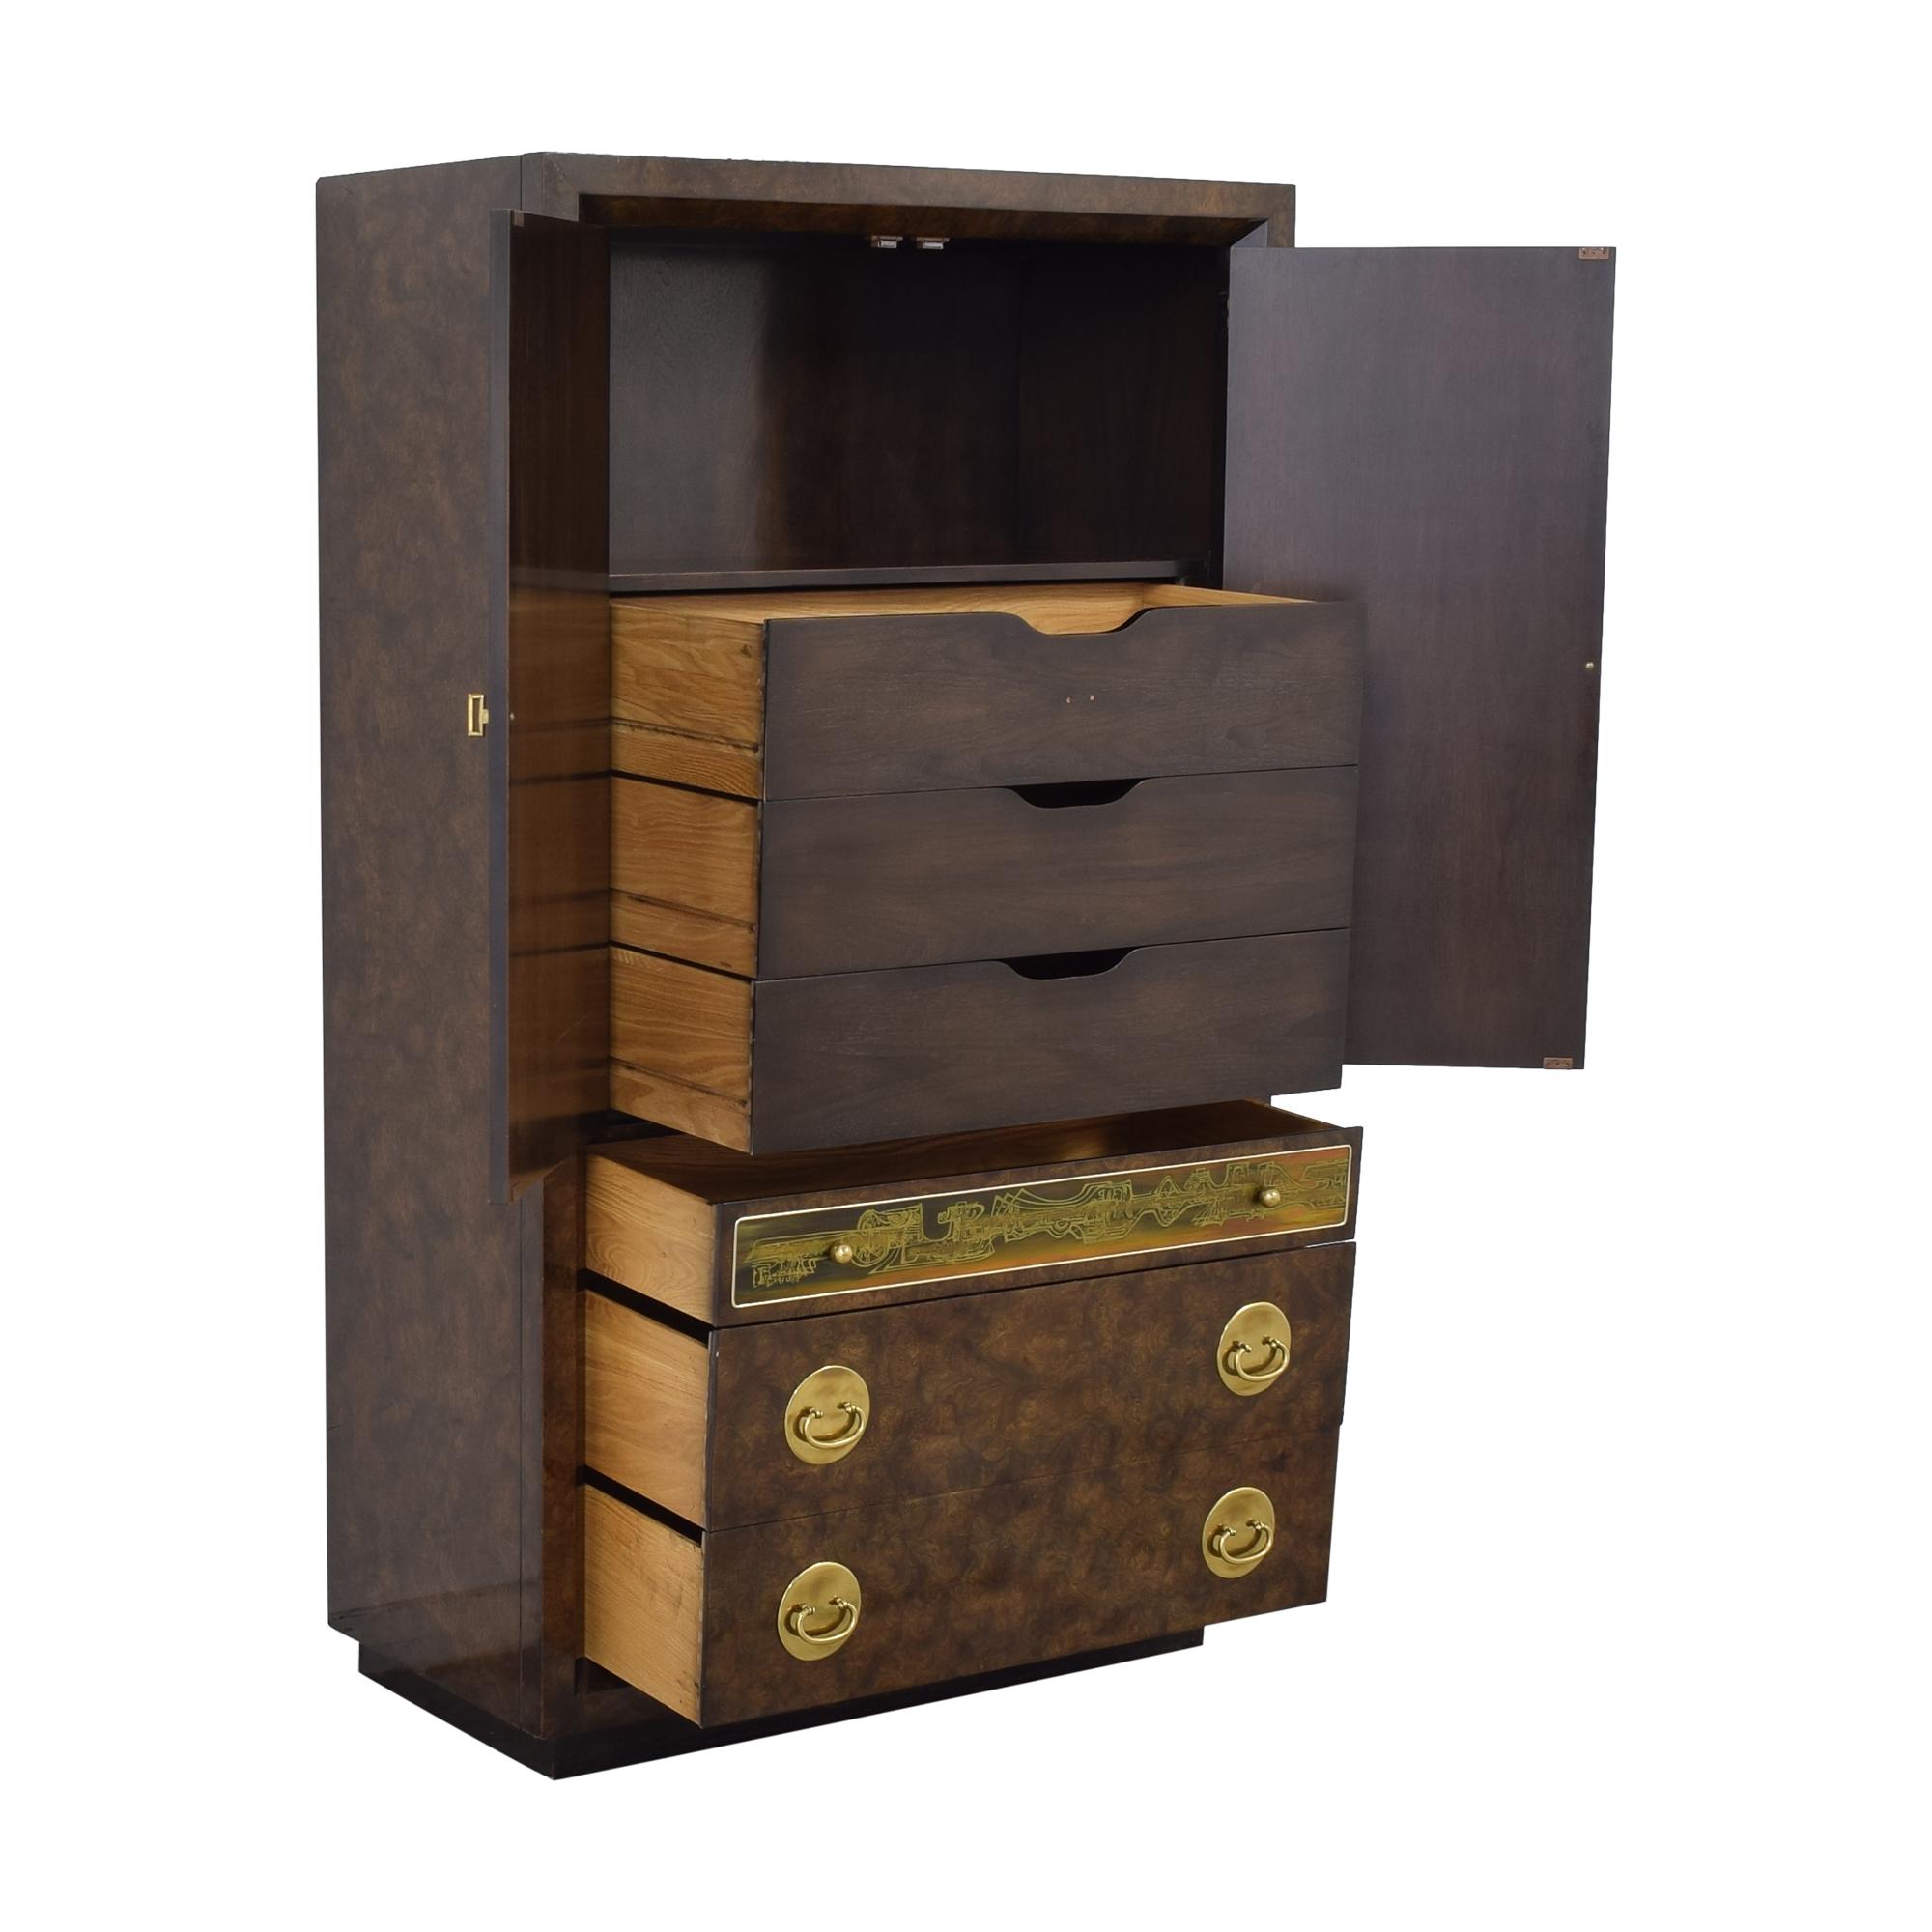 Mastercraft Furniture Mastercraft Burlwood Armoir Dresser Vintage Wardrobes & Armoires